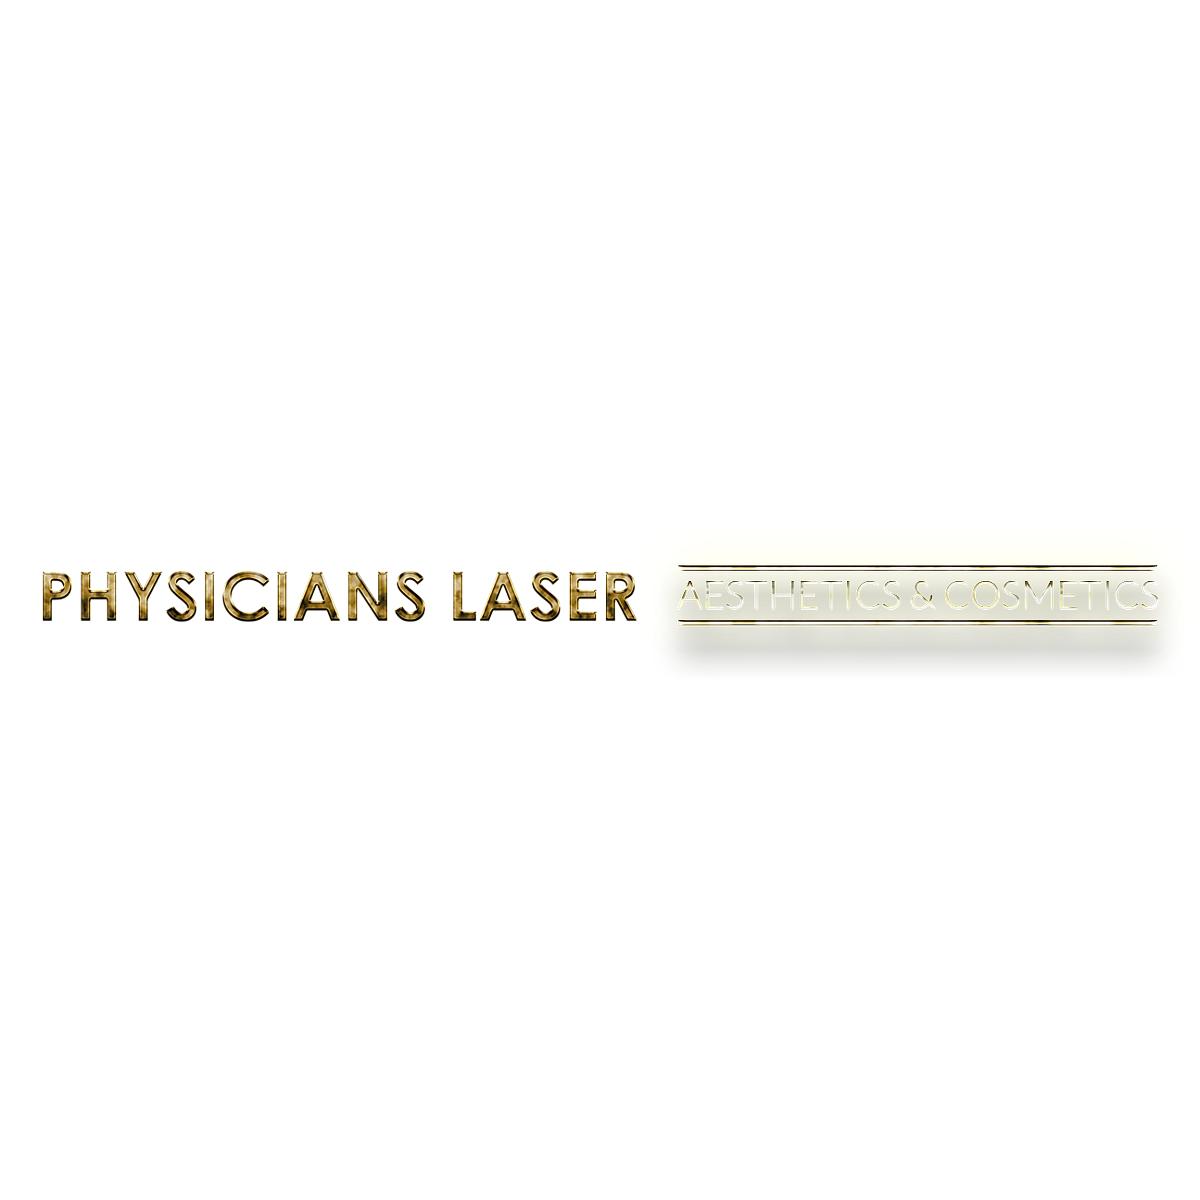 Physicians Laser Aesthetics & Cosmetics